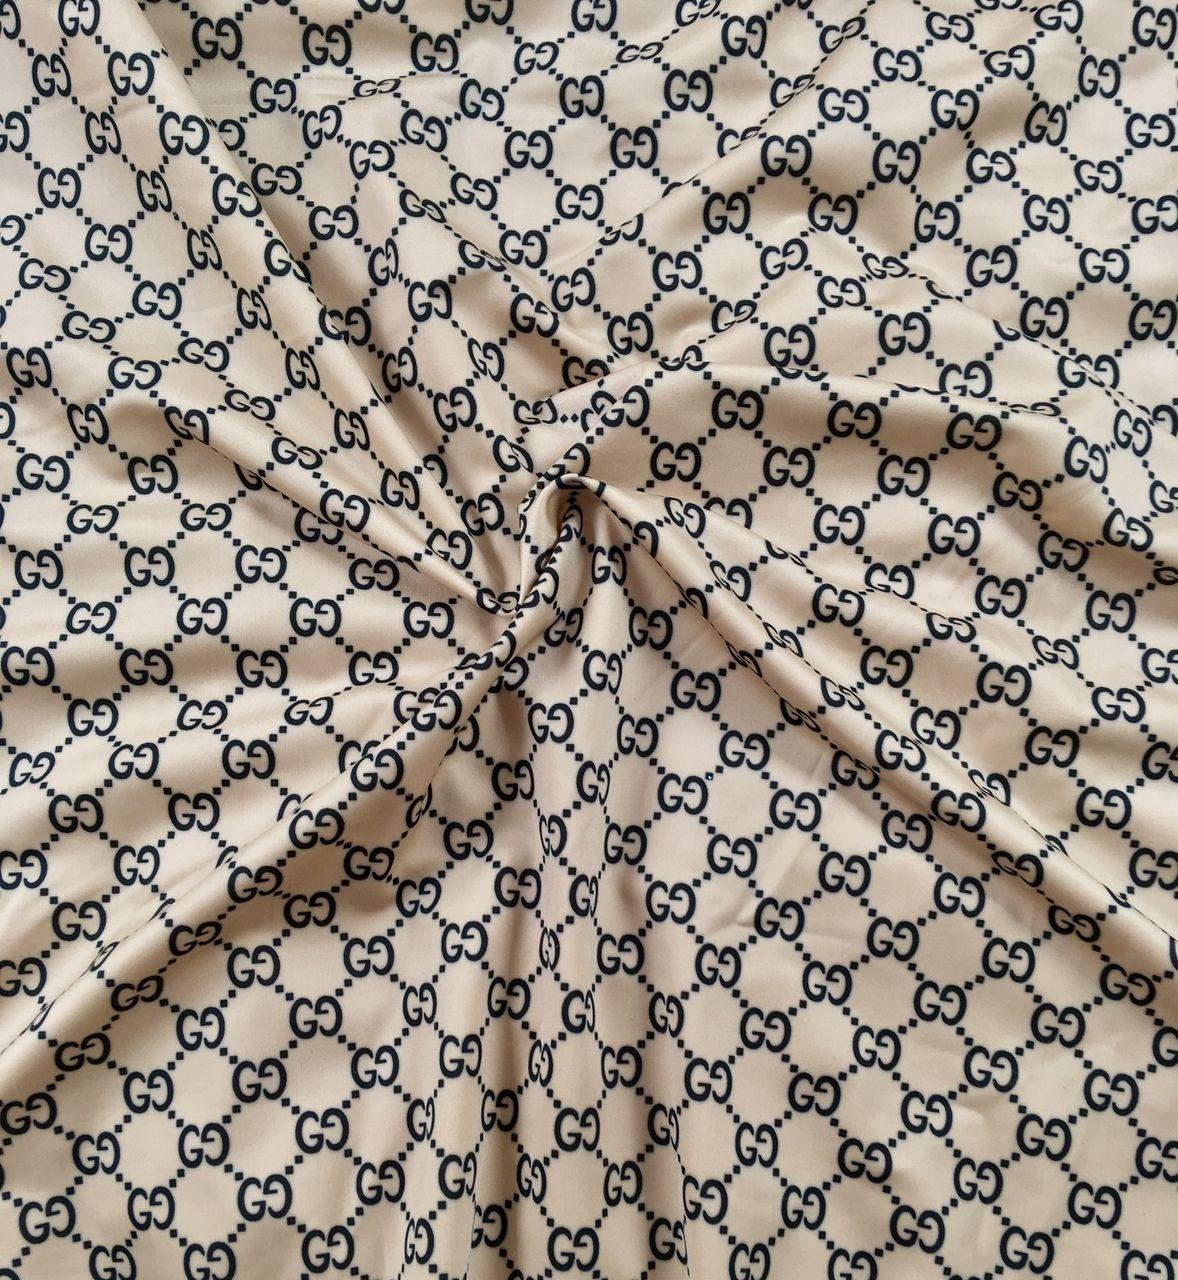 622f32cb5 Ritzy Baby Designs, LLC - Tan Gucci Inspired Fabric by the Yard, $19.95 (